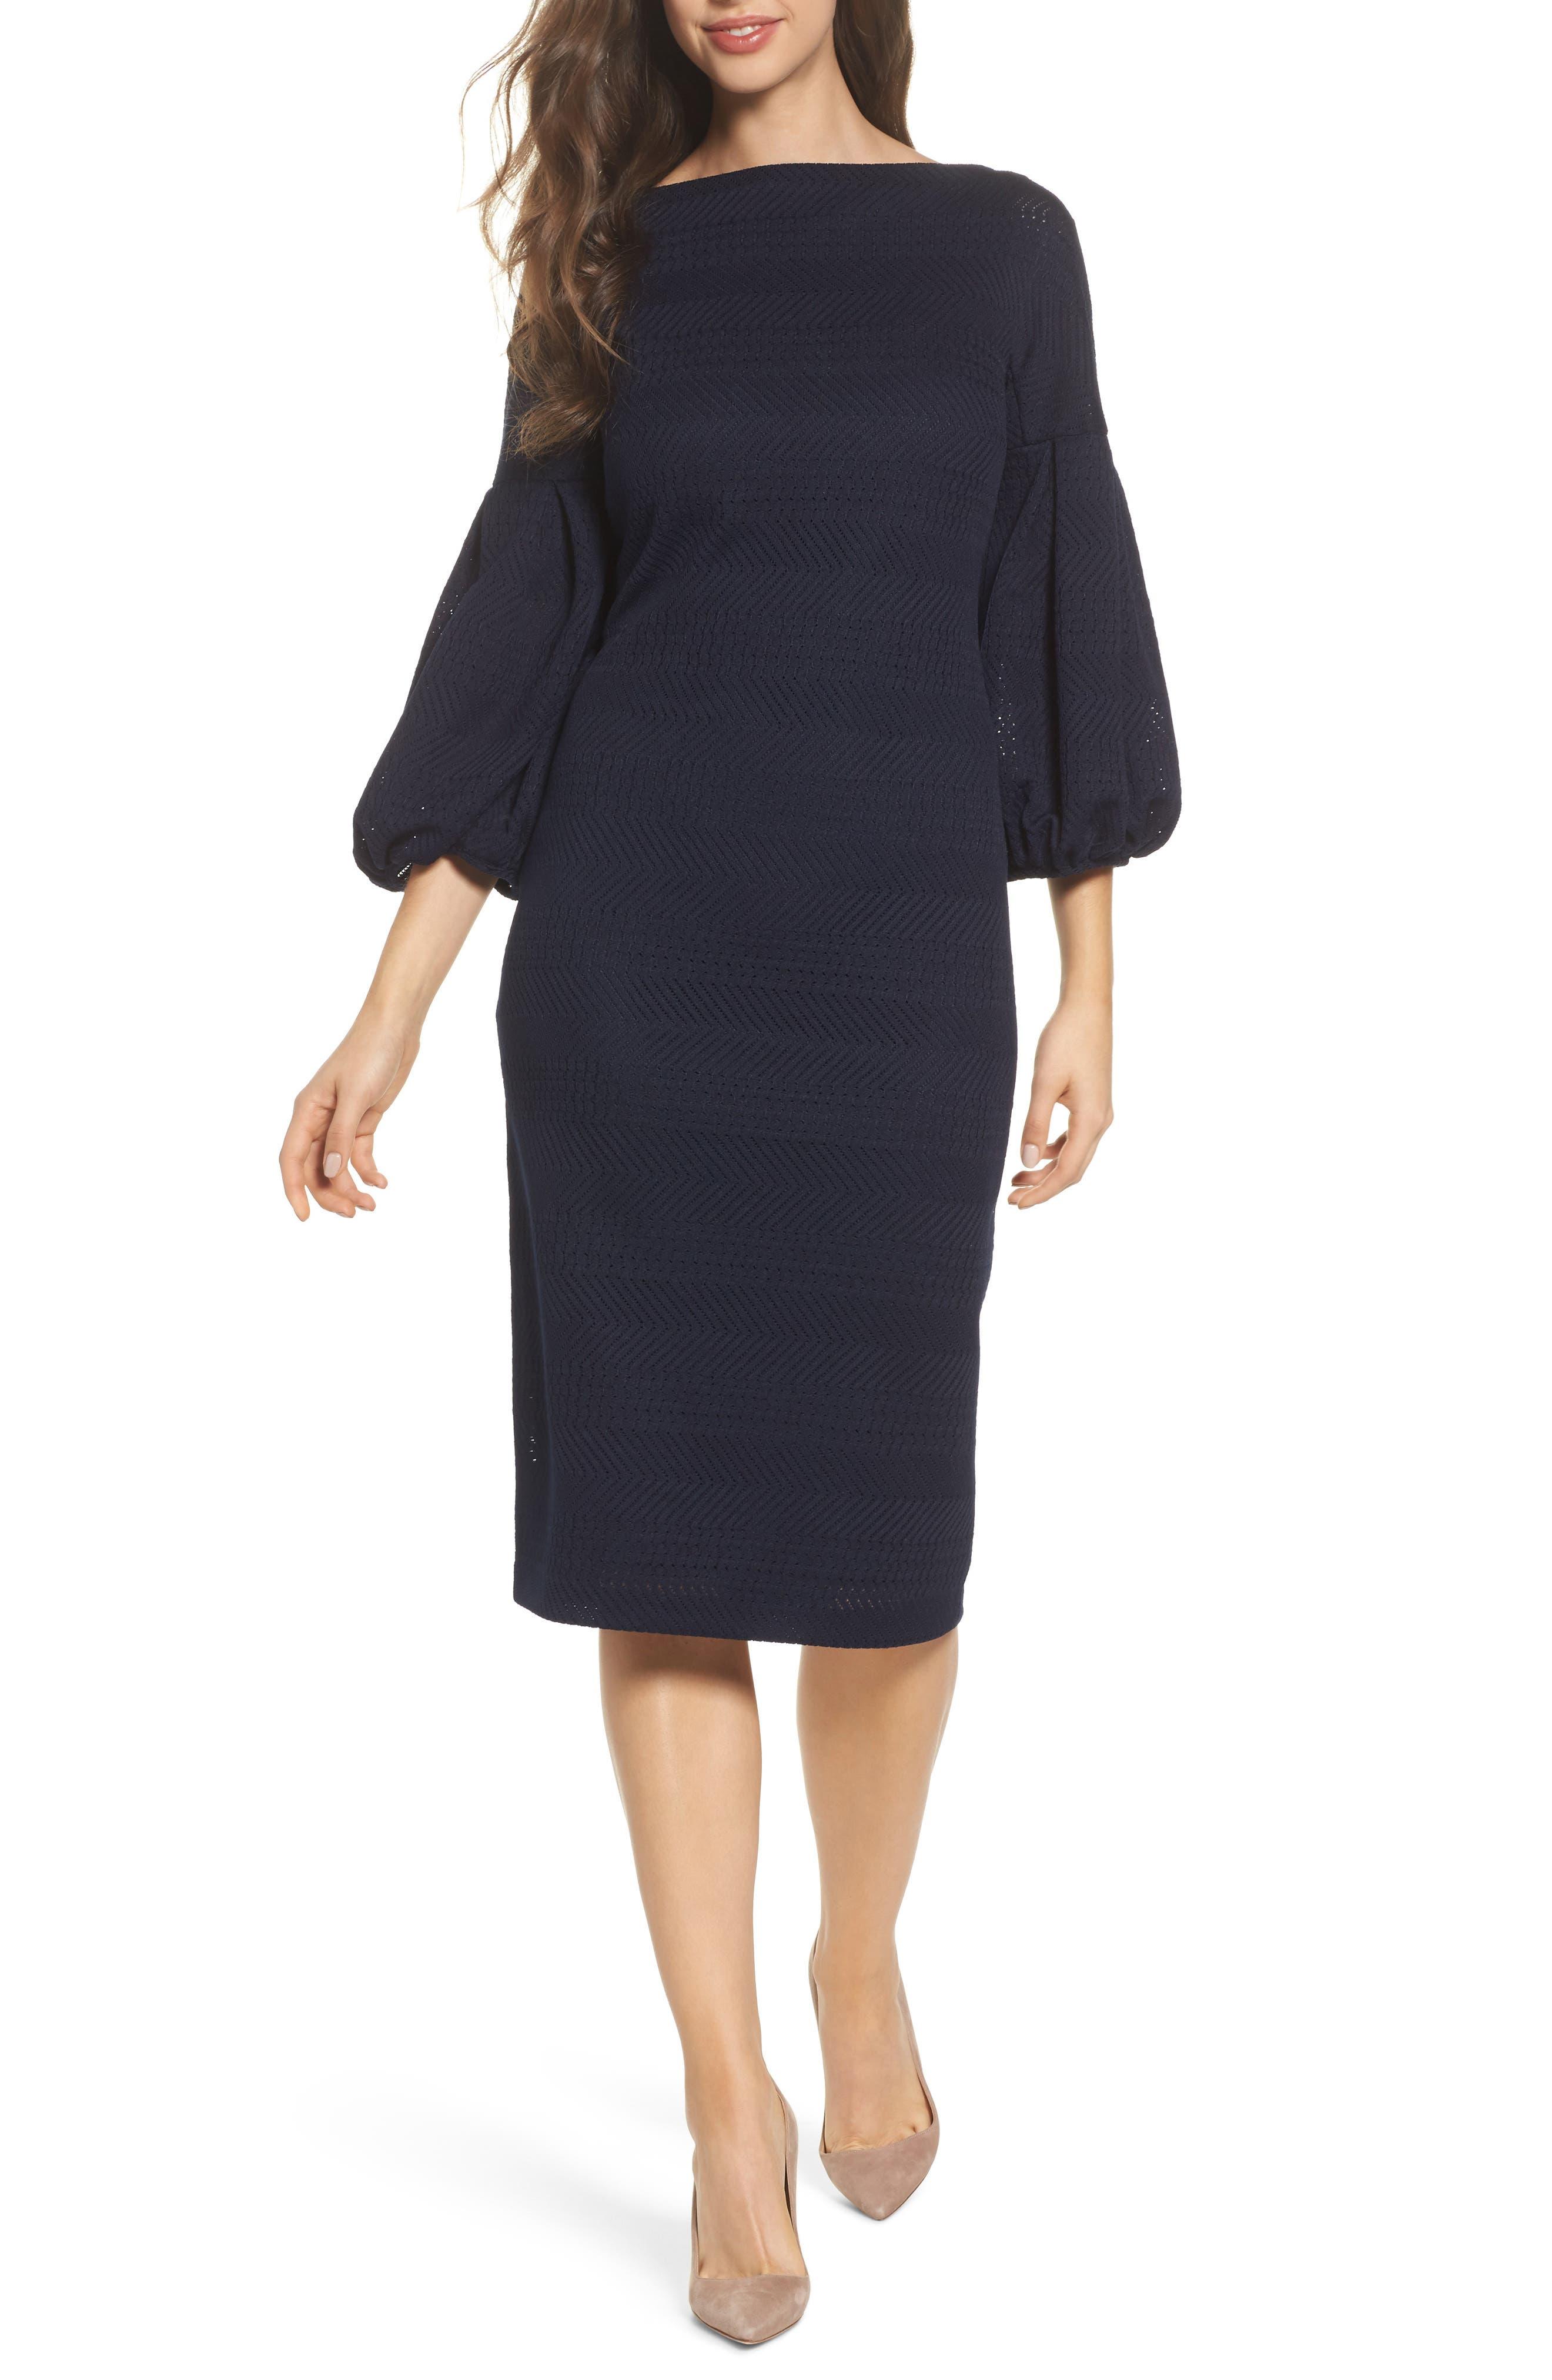 Alternate Image 1 Selected - Maggy London Solid Herringbone Knit Dress